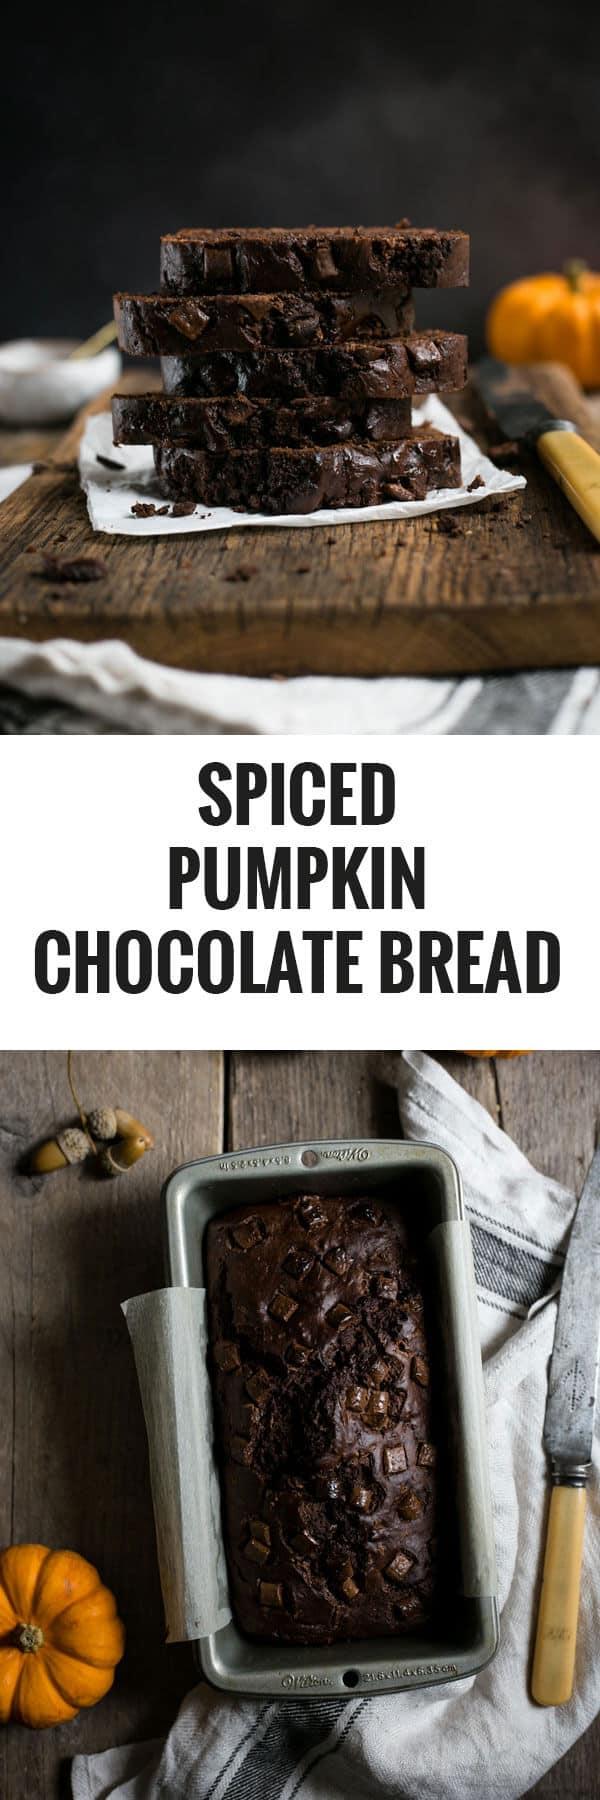 Spiced pumpkin chocolate bread. Extremely tasty, moist and #vegan friendly! #pumpkin #chocolate | via @annabanana.co